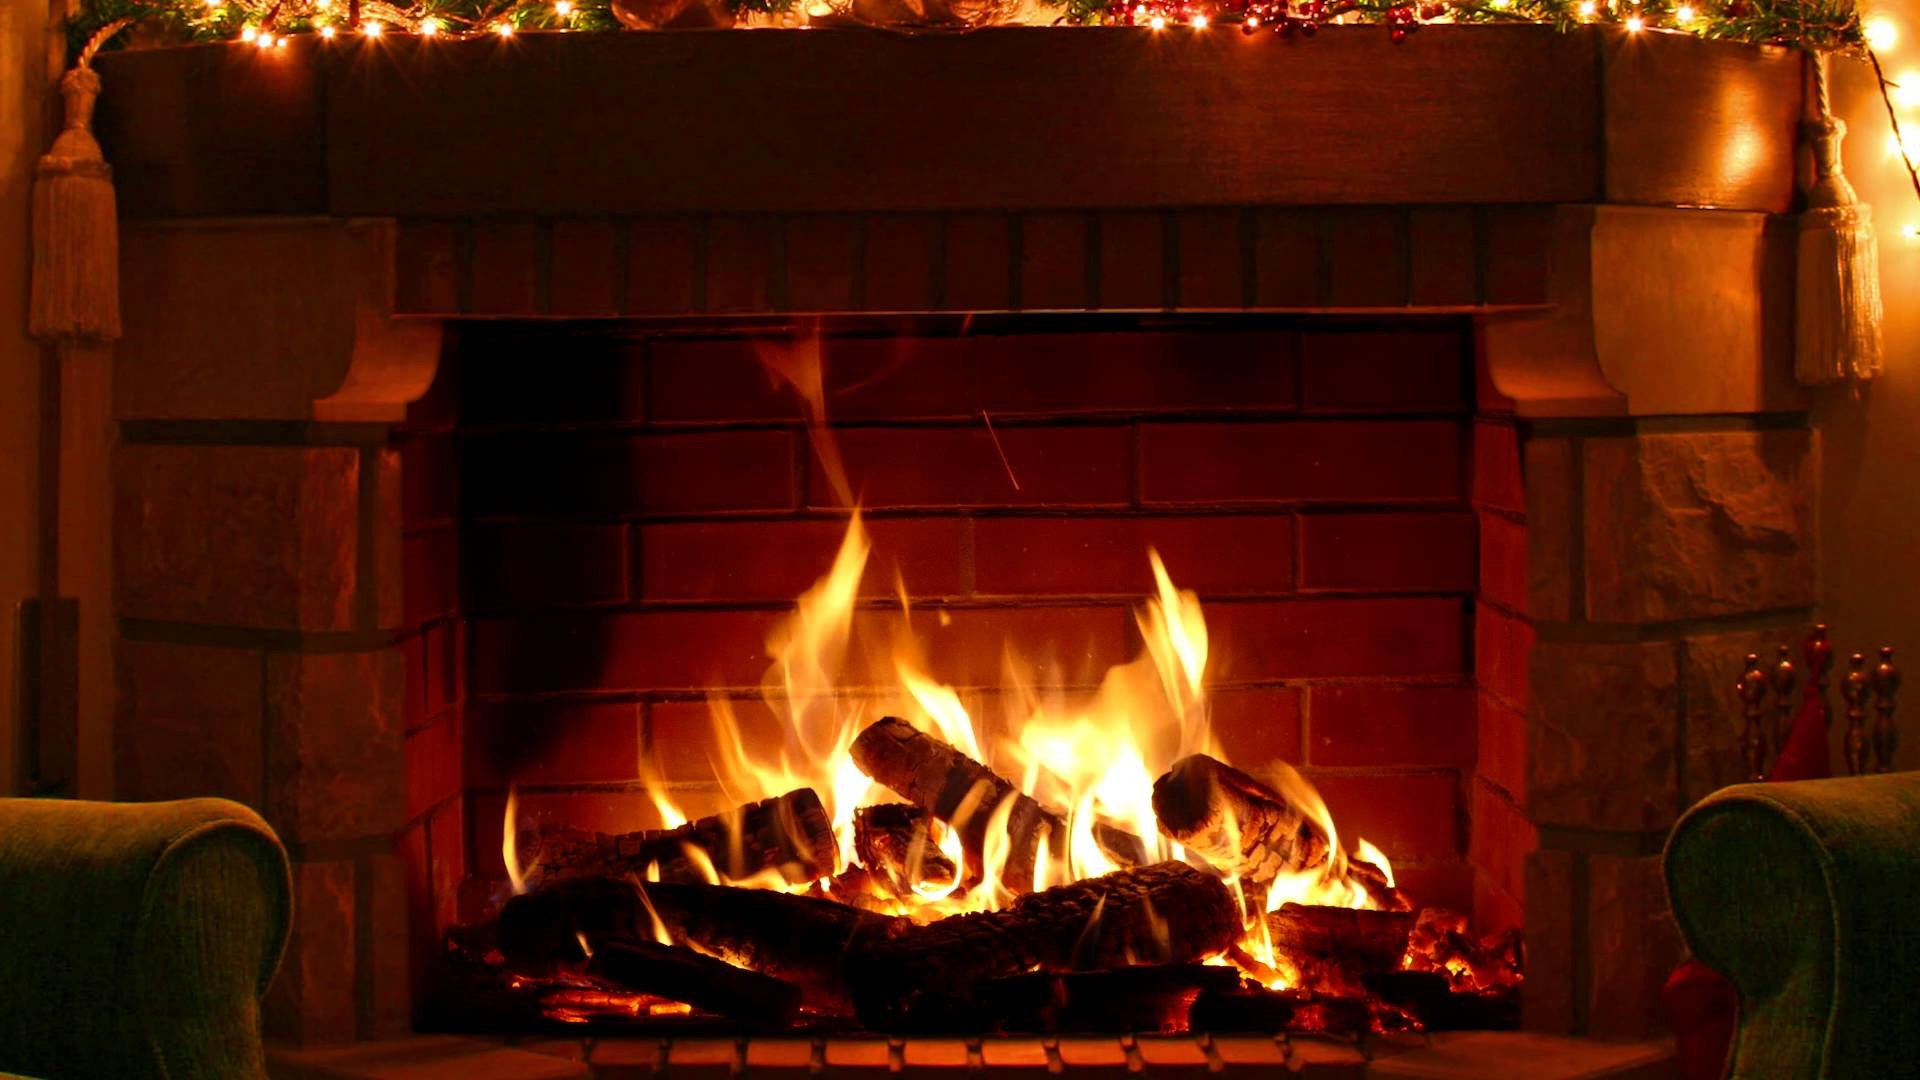 Christmas Wallpaper Fireplace  Fireplace Wallpaper 57 images